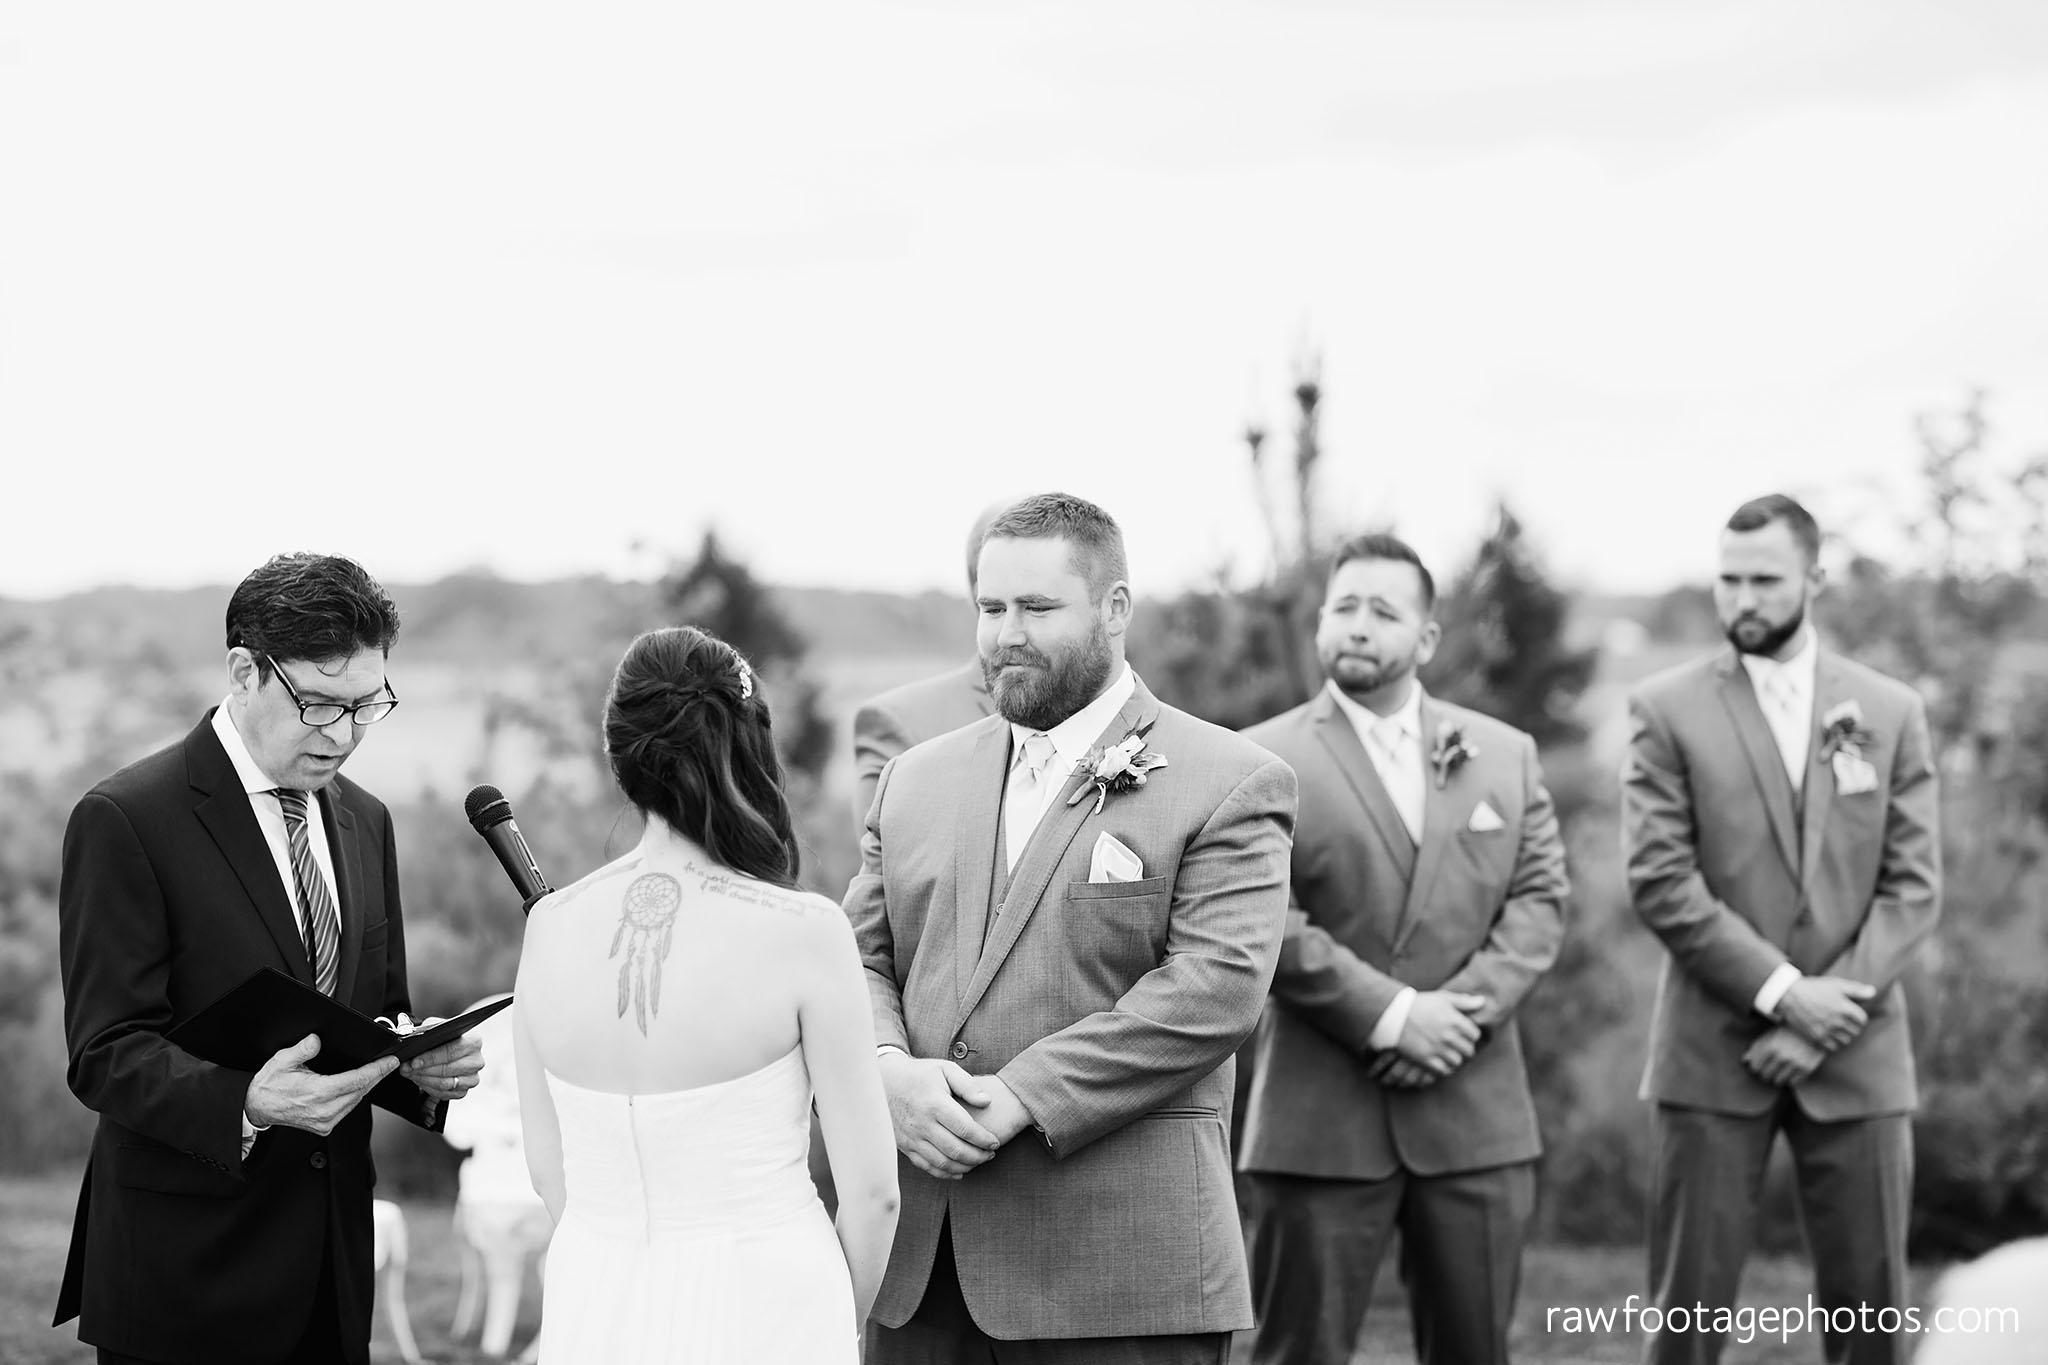 london_ontario_wedding_photographer-century_wedding_barn-raw_footage_photography-diy_wedding067.jpg